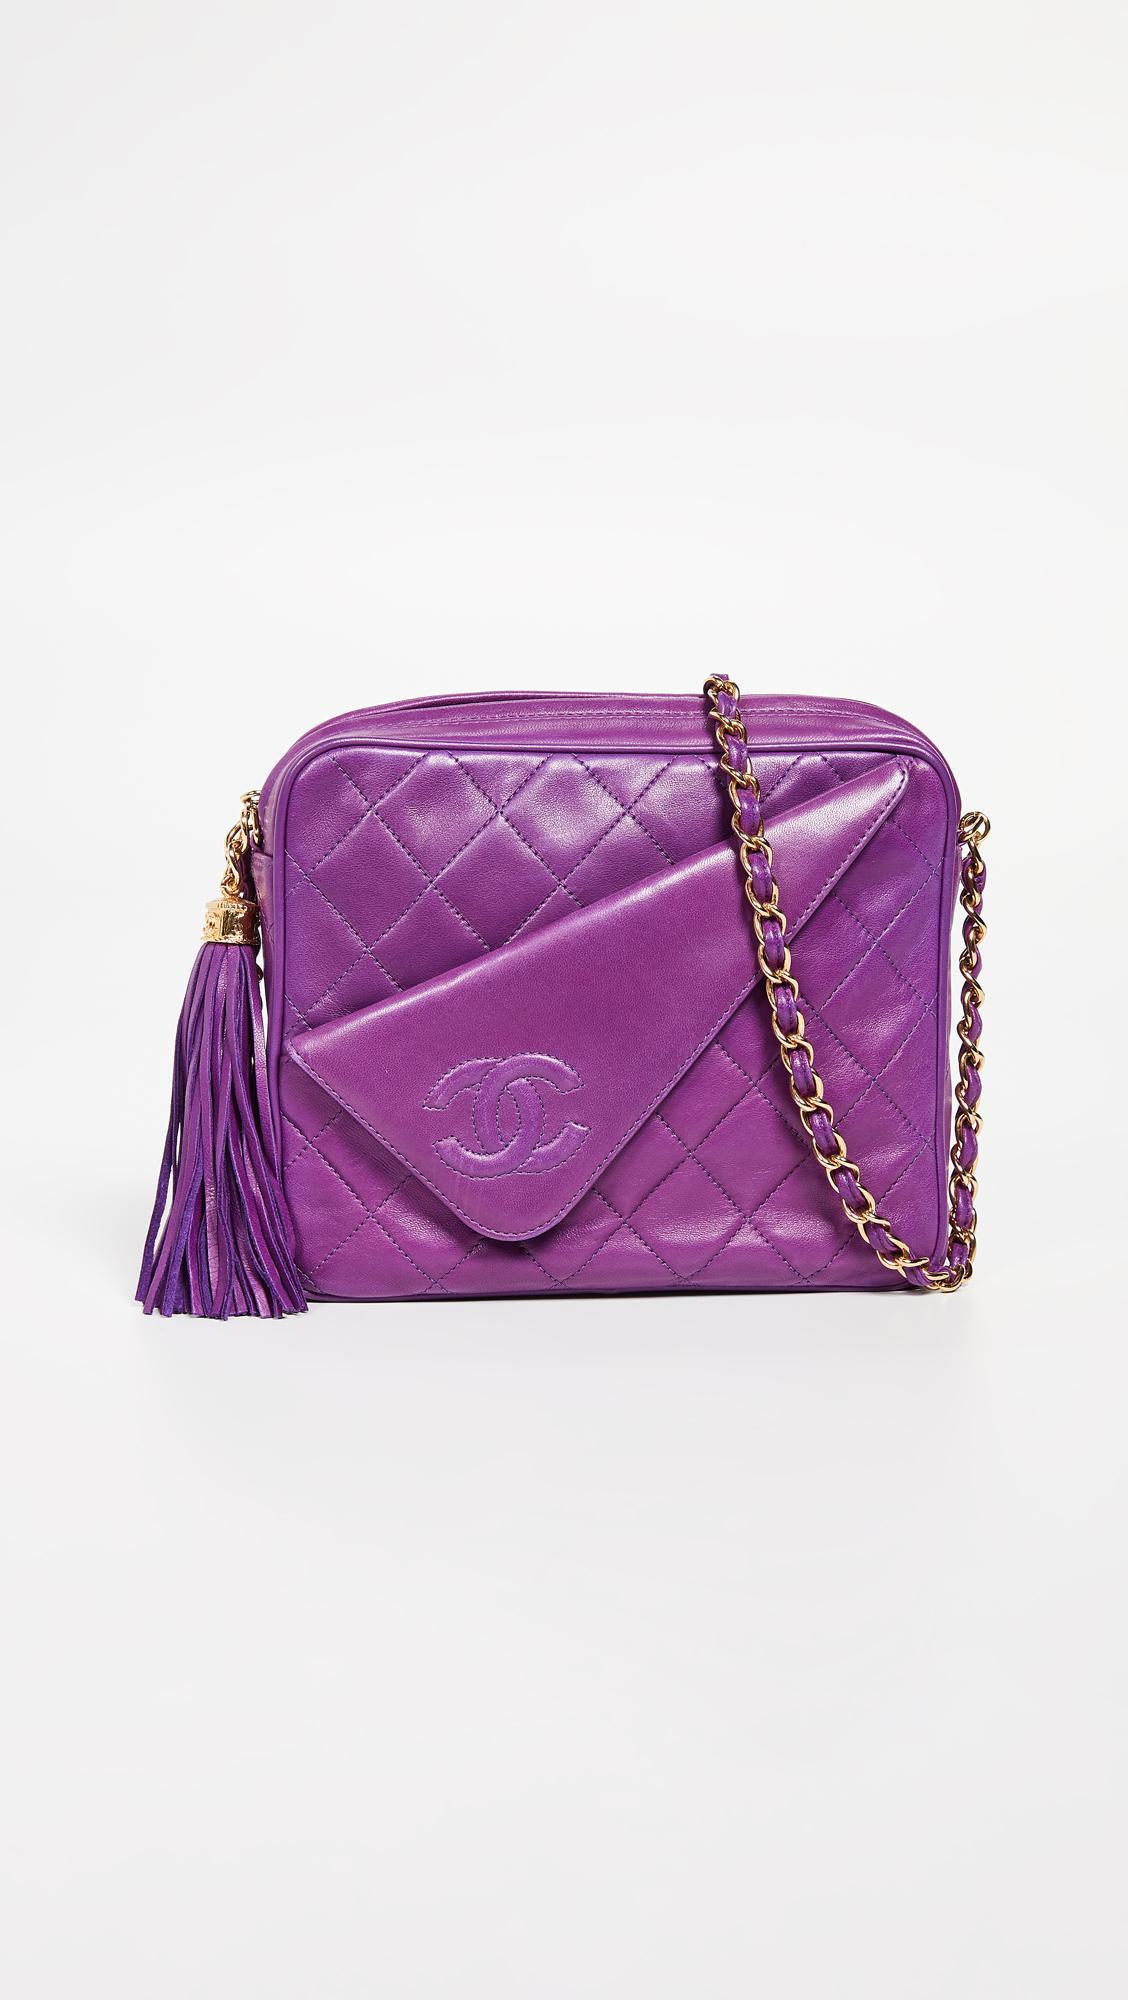 b85d18560adf What Goes Around Comes Around Chanel Purple Lambskin Medium Camera ...